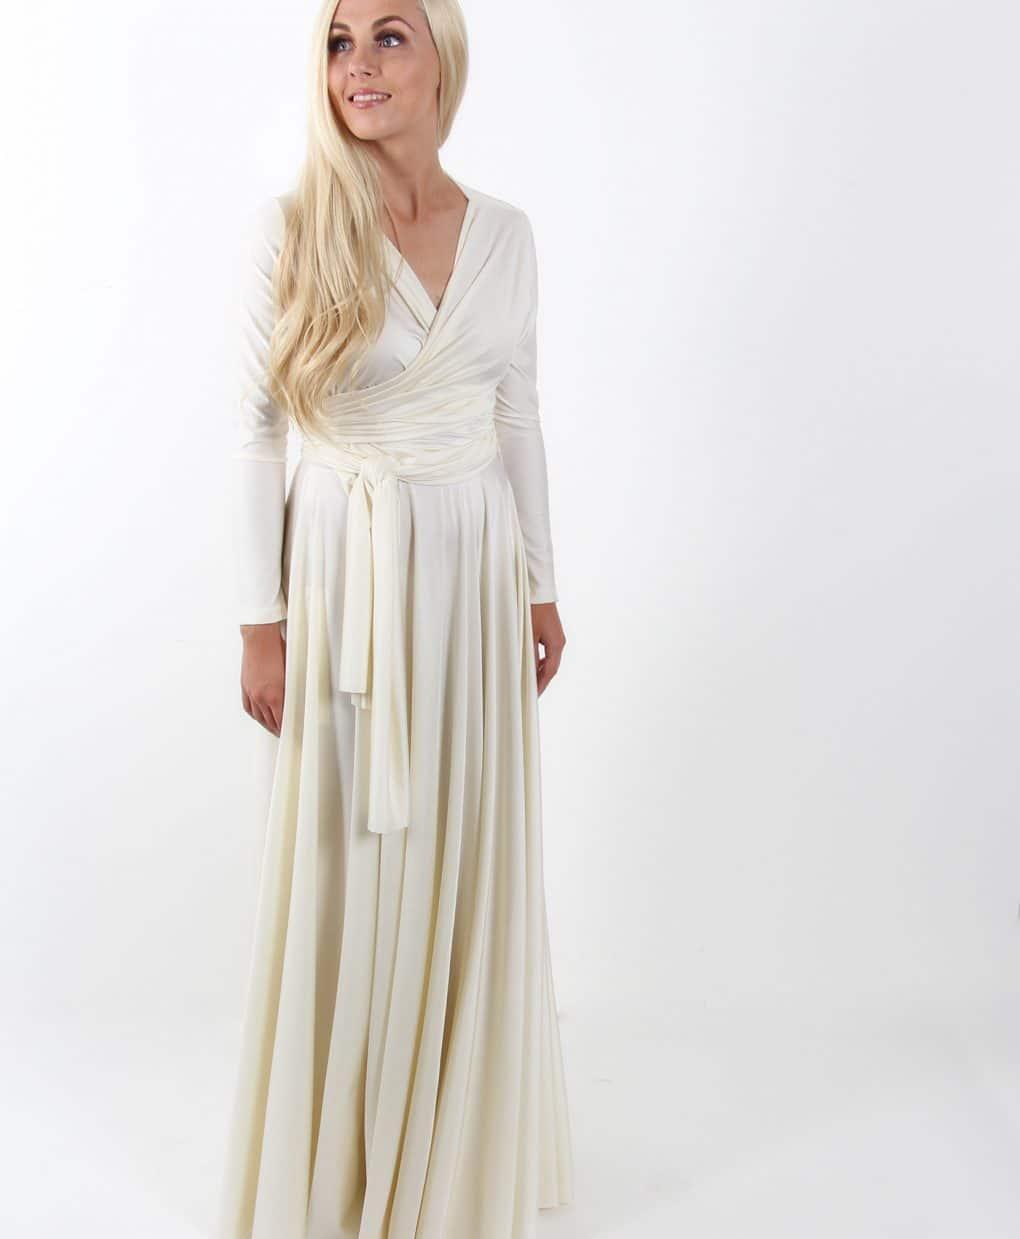 Goddess-By-Nature-Ivory-Long-Sleeve-Multiway-Bridal-Dress-Alila